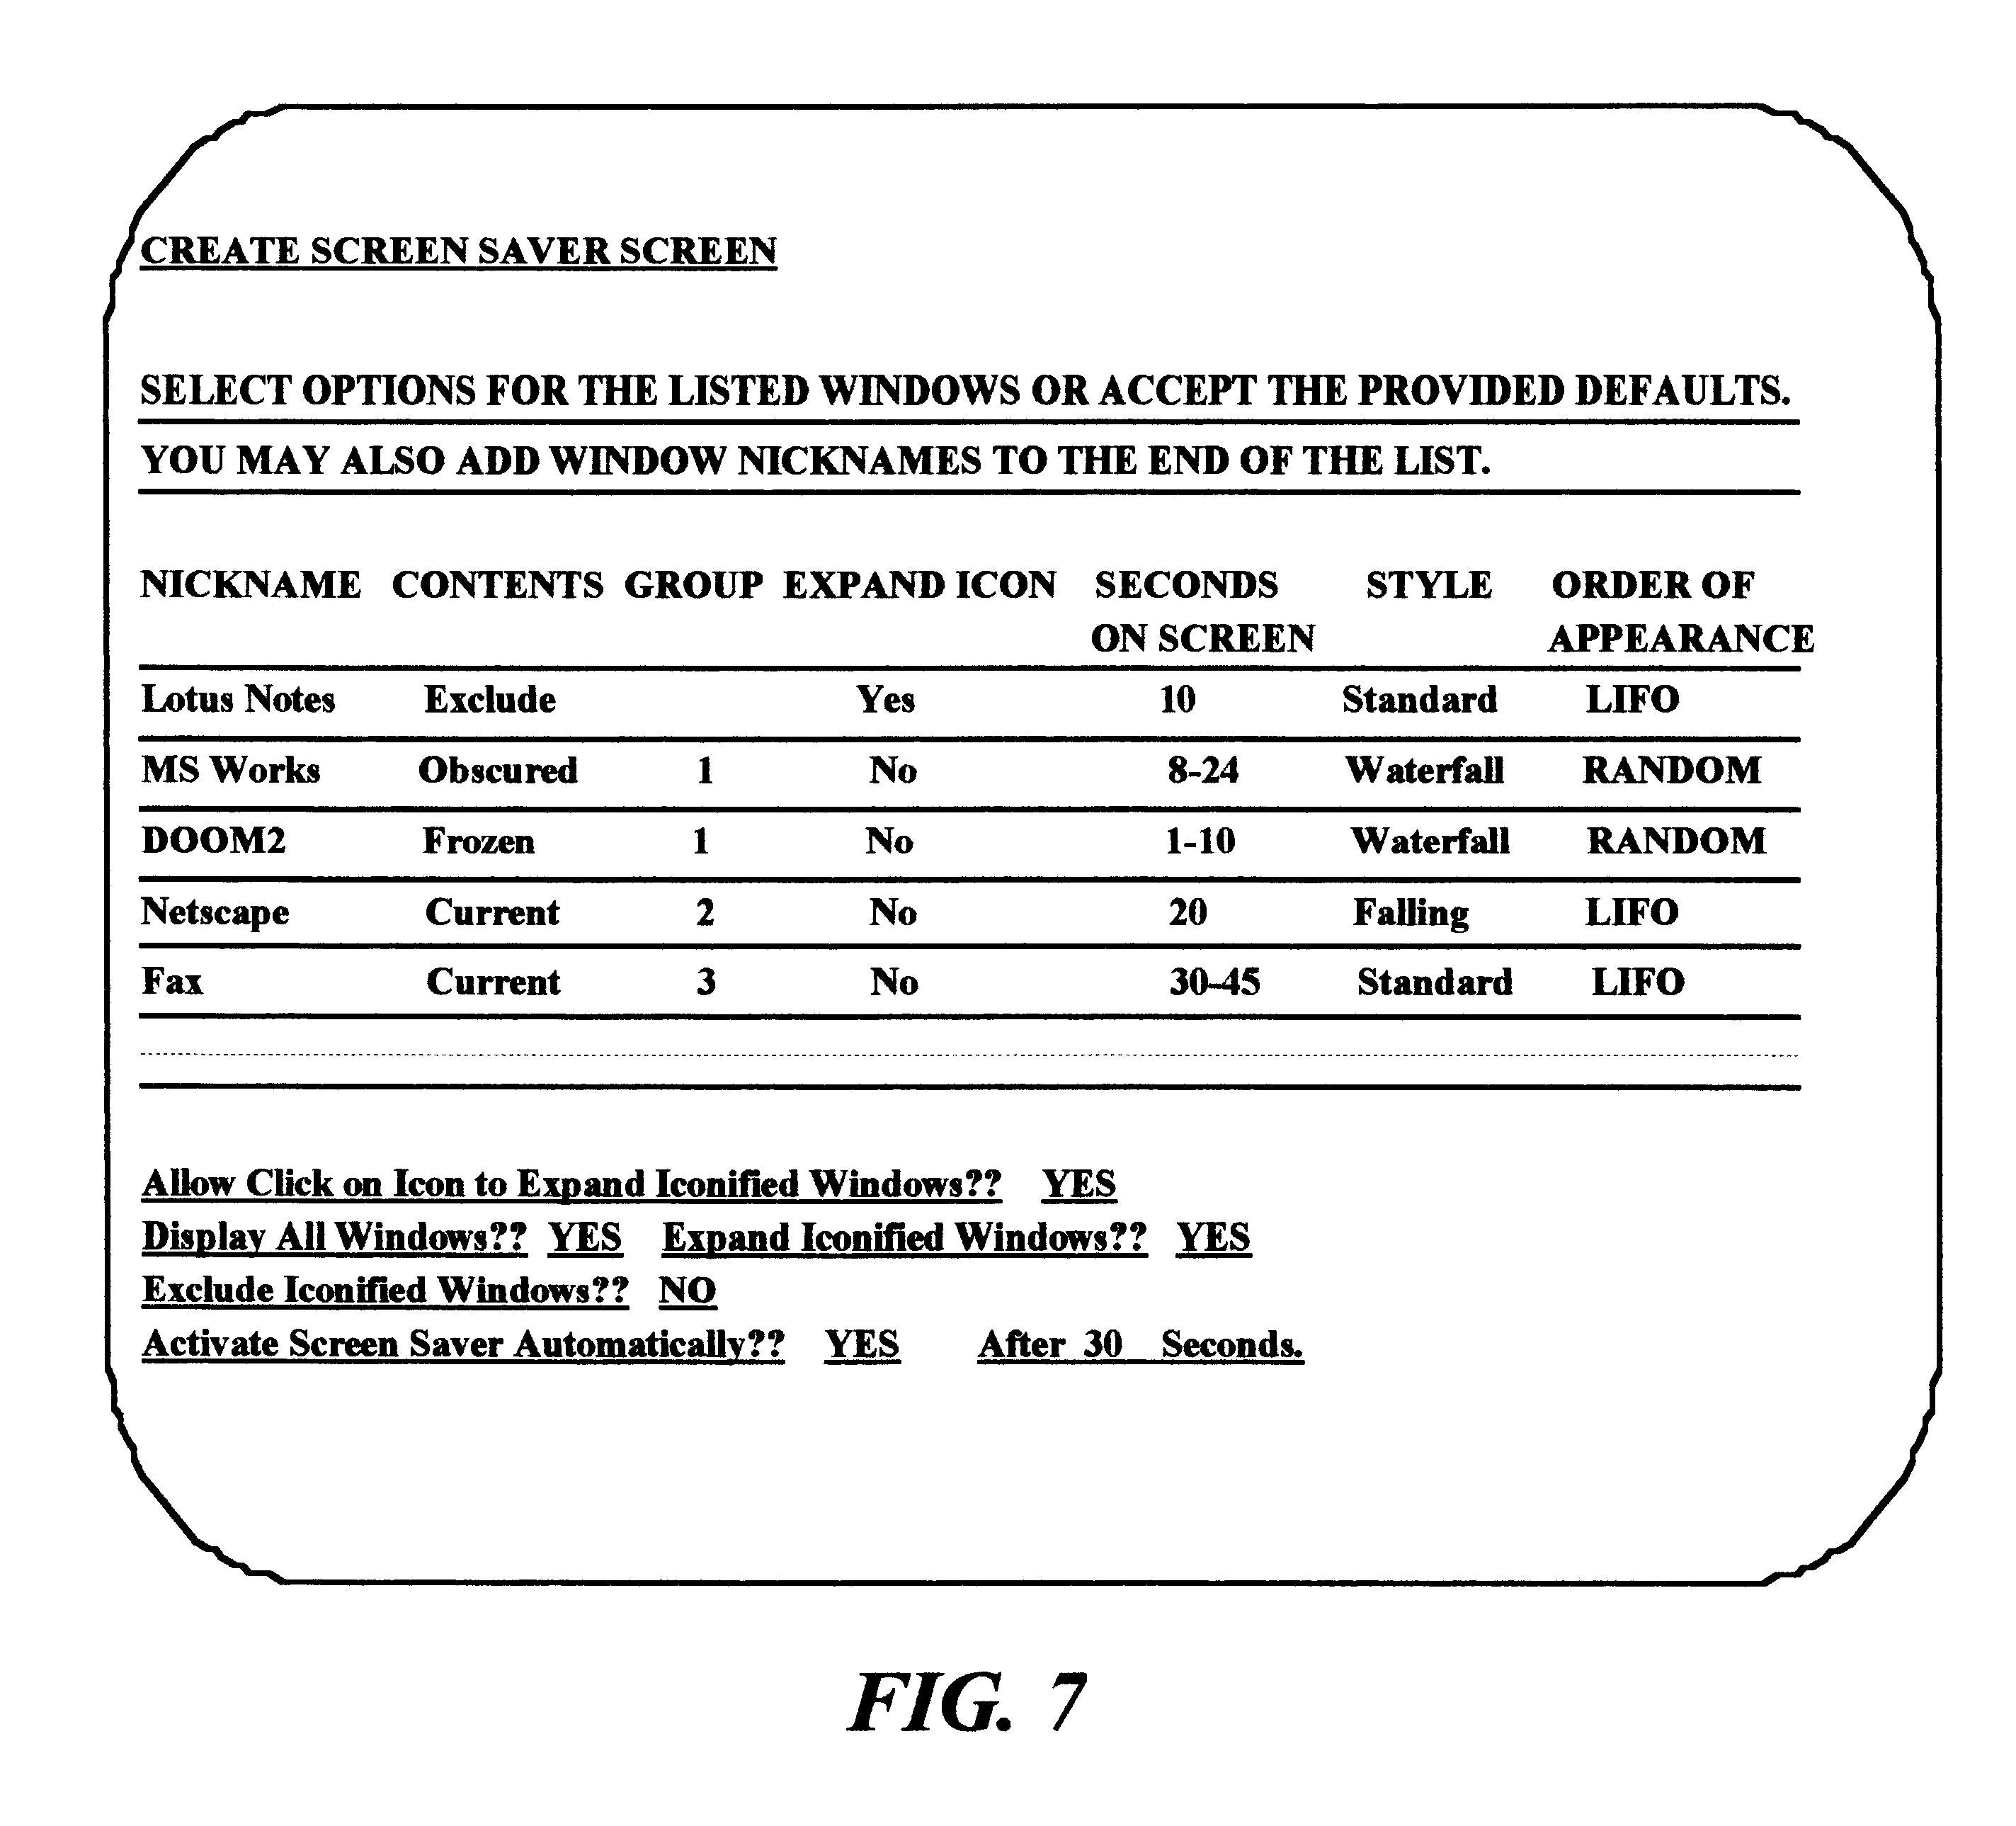 US6353449B1 - Communicating screen saver - Google Patents